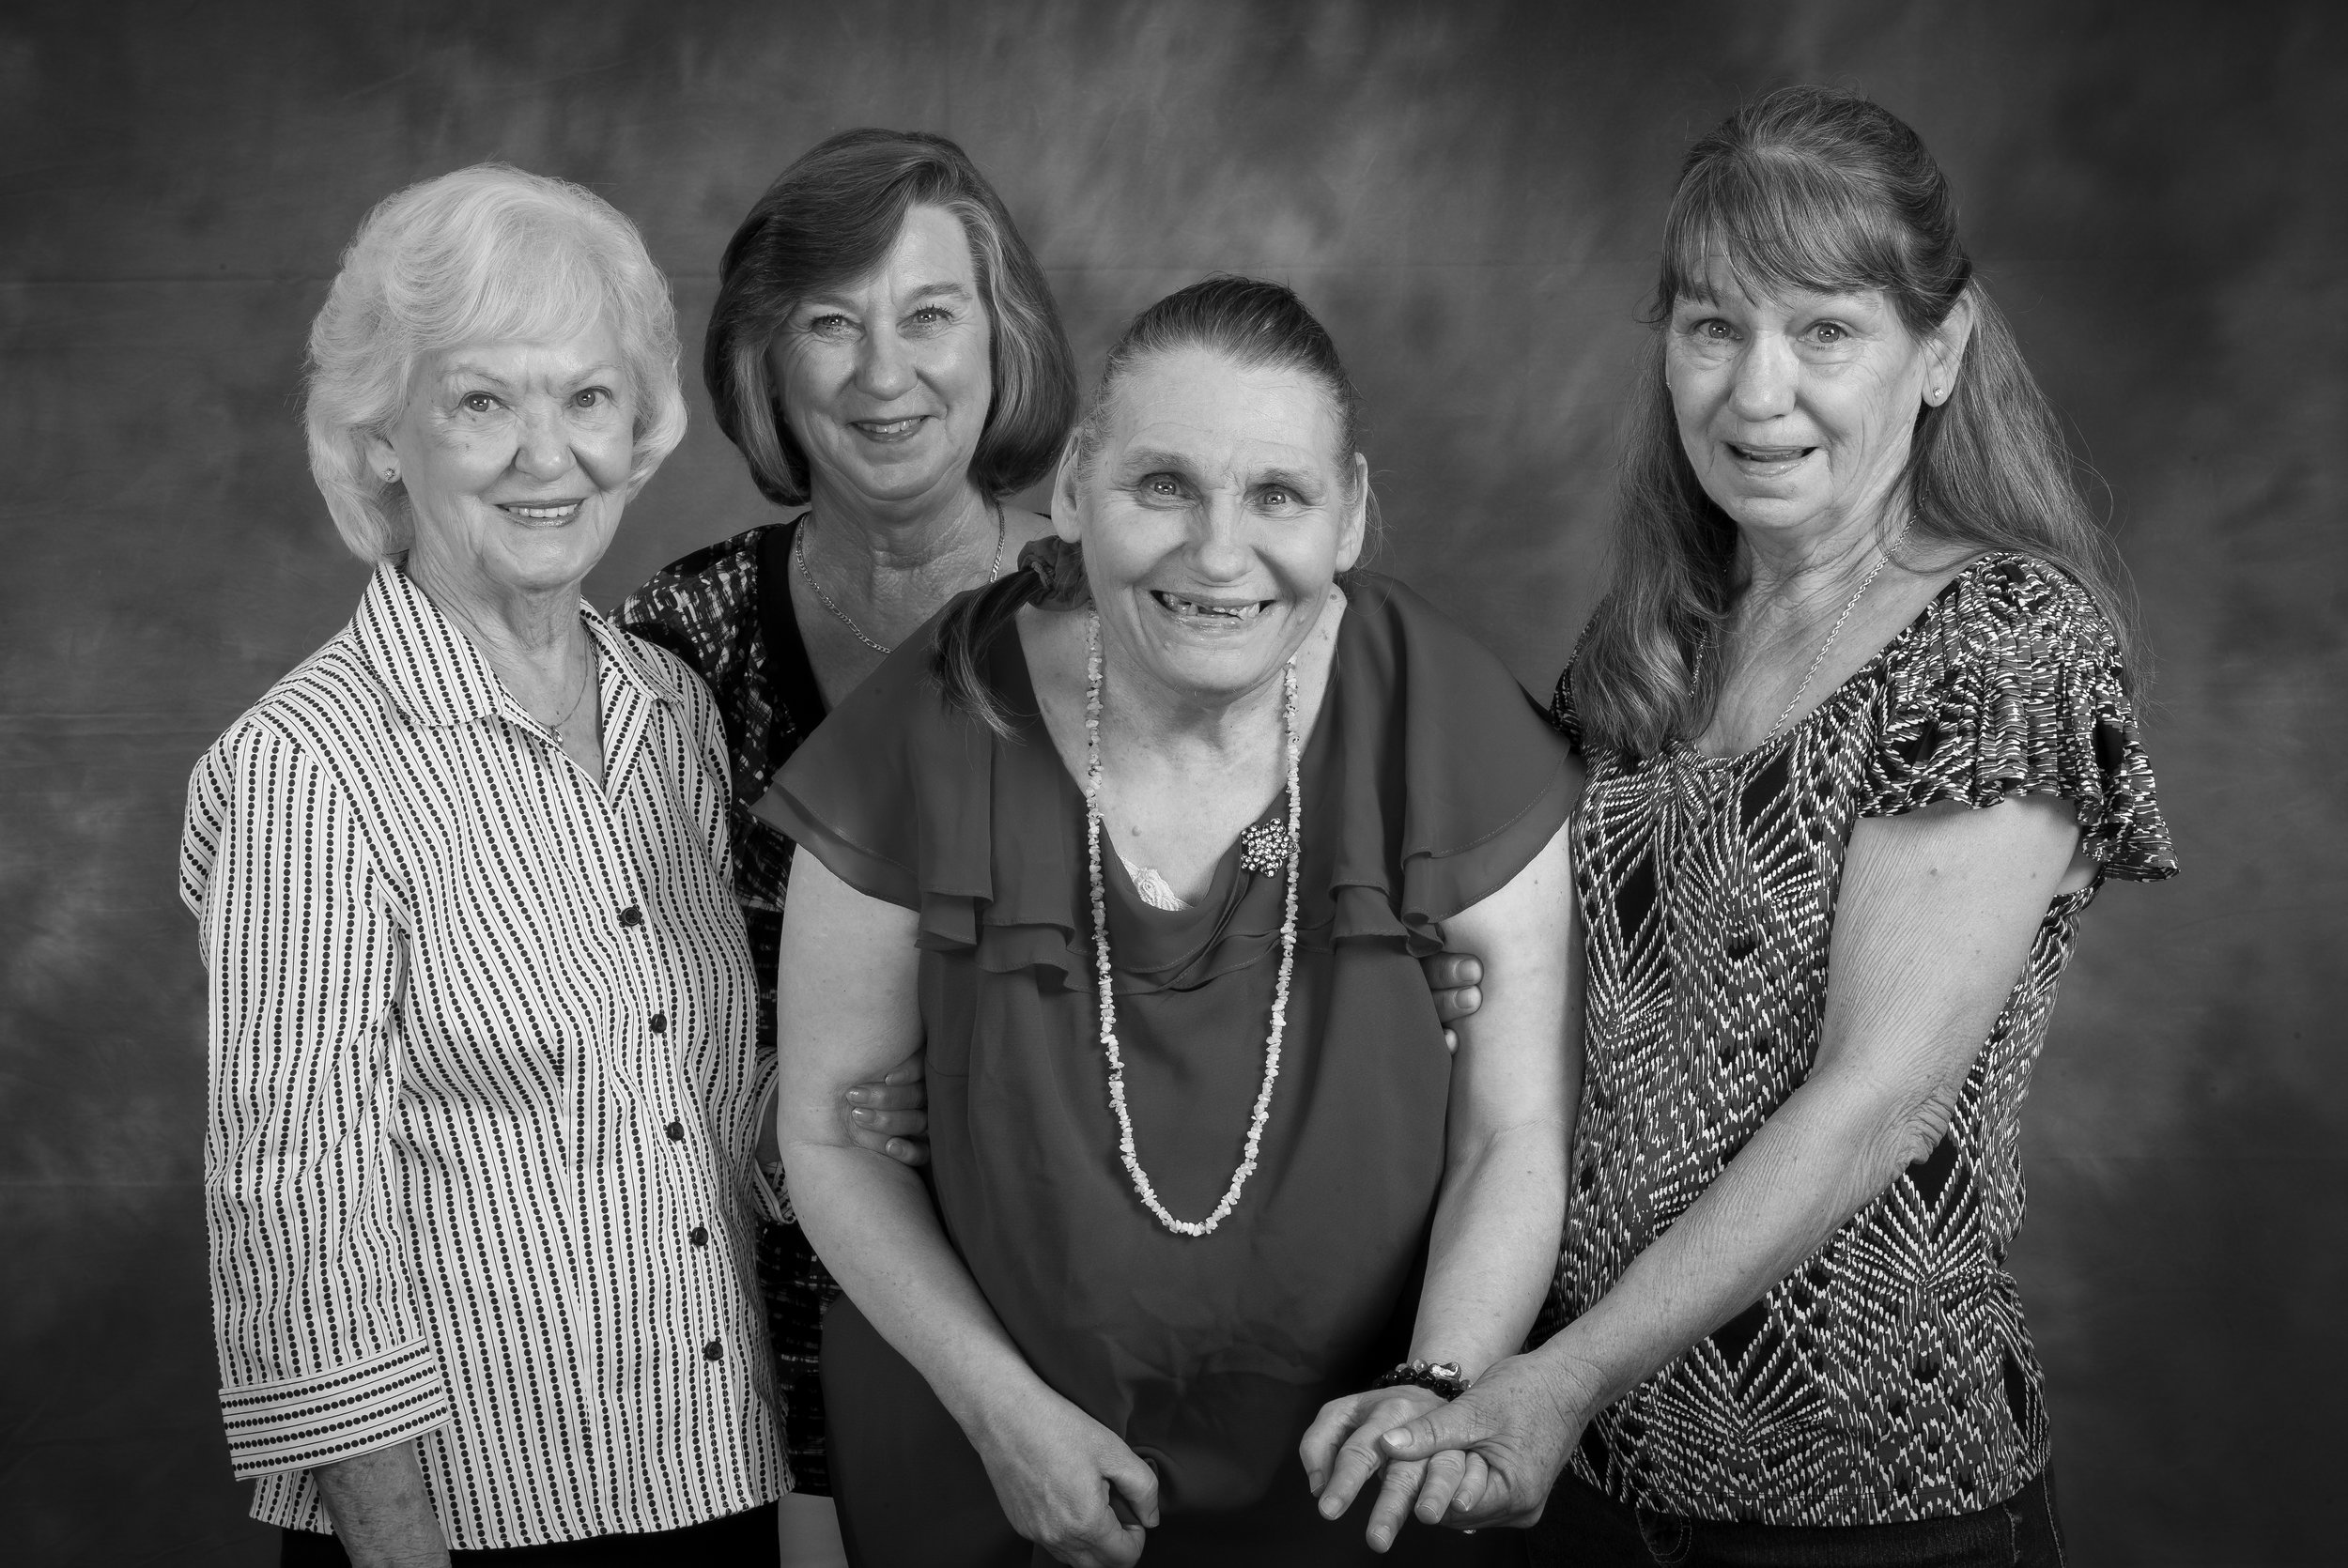 The Lawler Family - Veta, Joan, Karen and Jeri